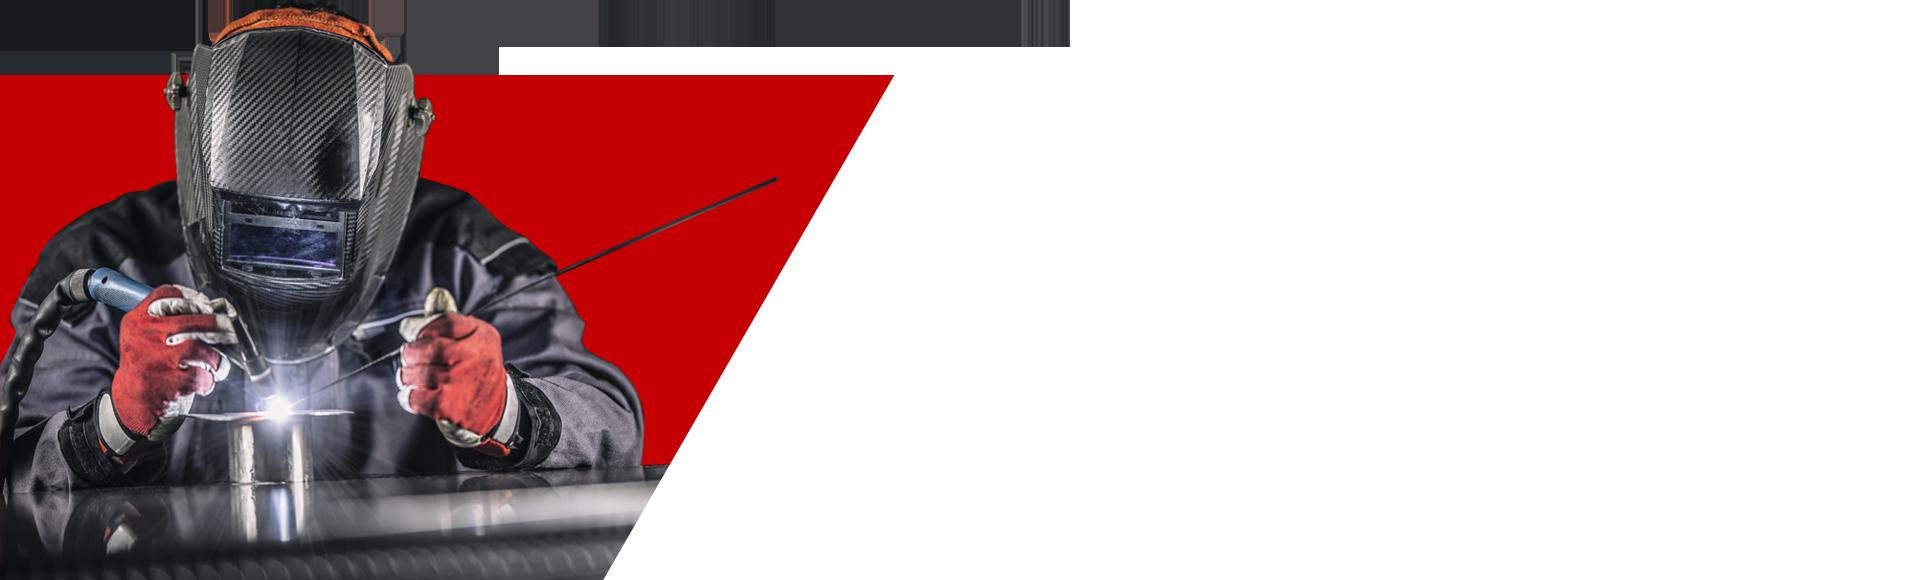 bg-assistenza-datawelding